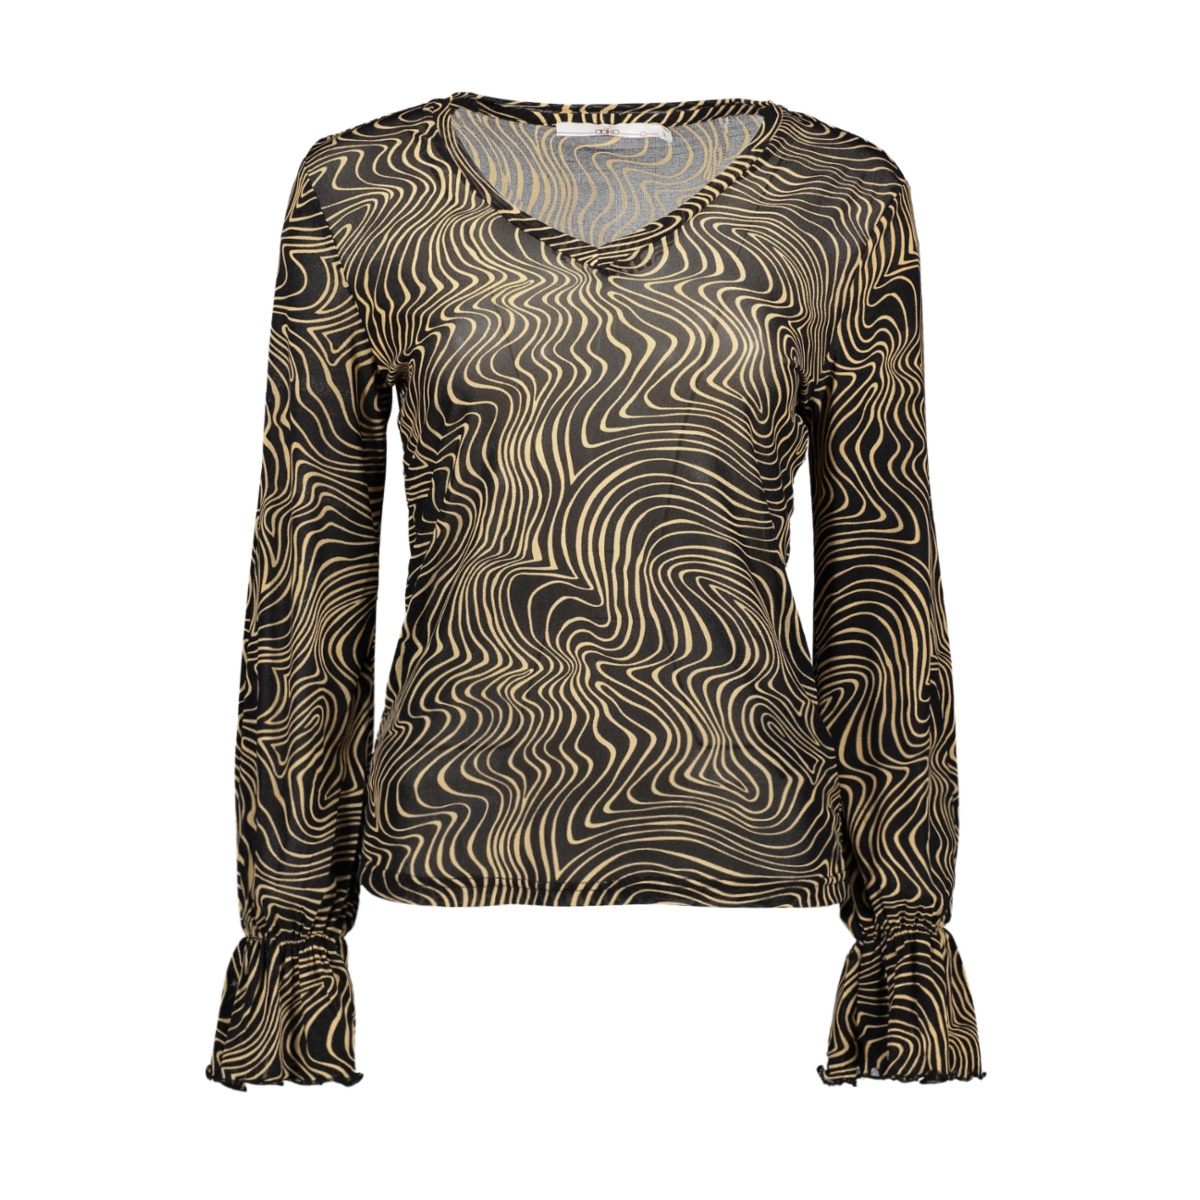 sayna pes 512 aaiko t-shirt cashmere